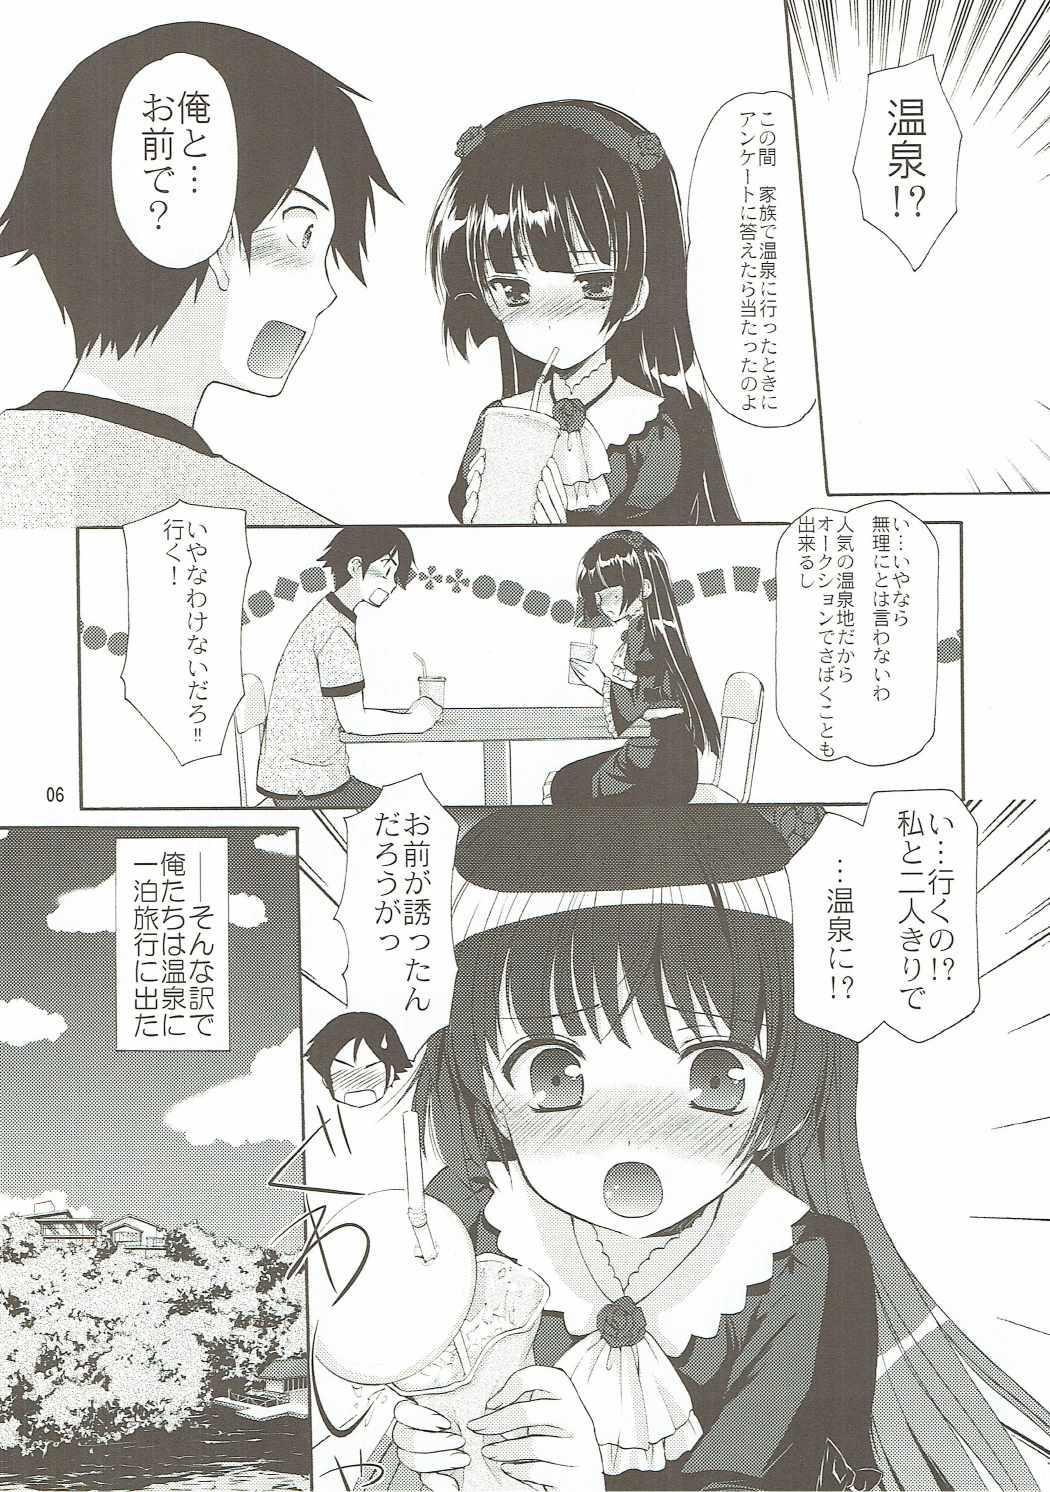 ANIME COLLECTION Imomuya Honpo - Singleton Anime Soushuuhen 4